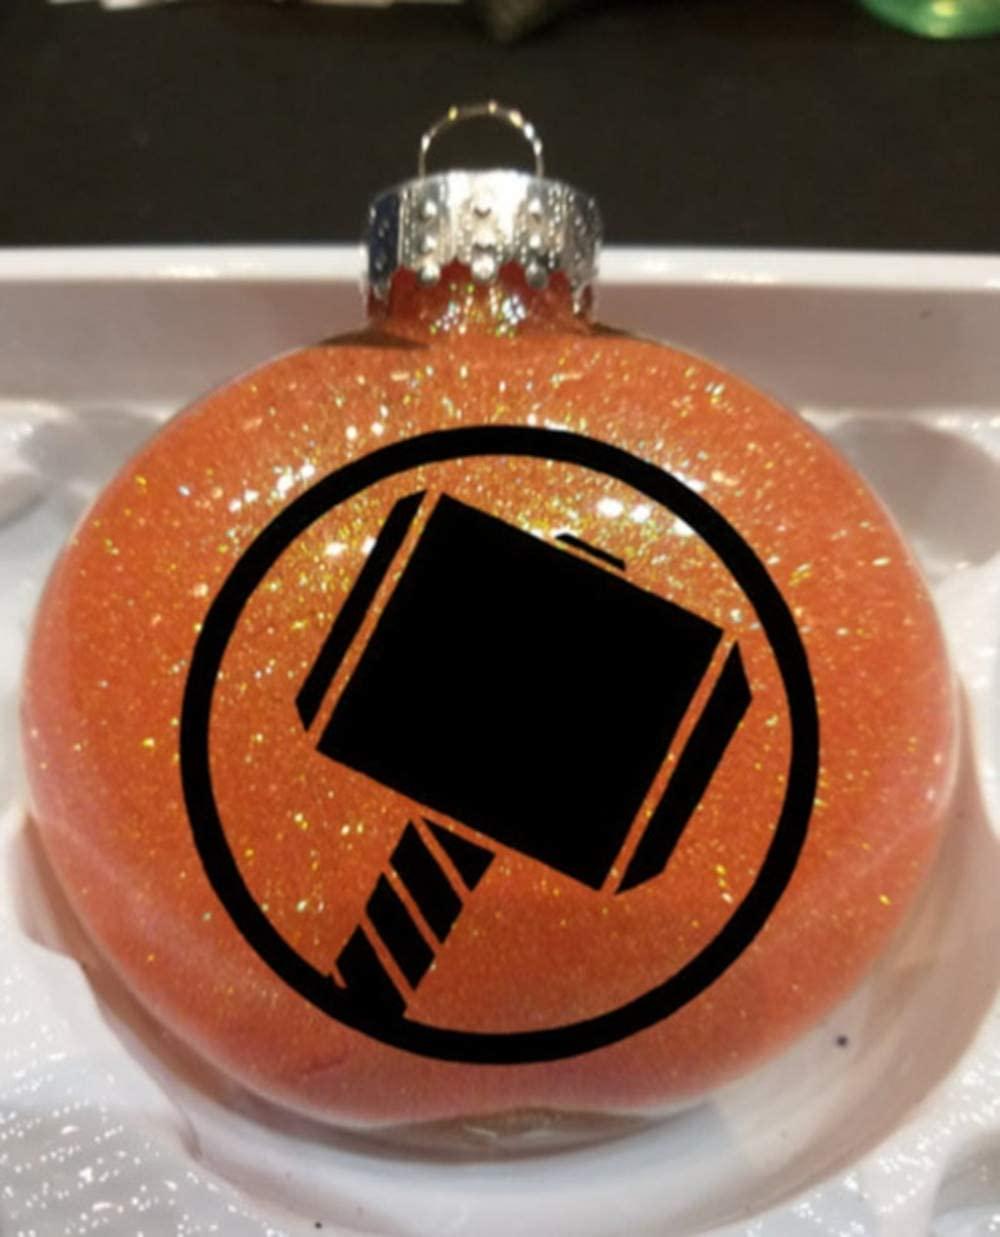 Merch Massacre Thor Oden Loki Comic Book Comics Super Hero Superhero Glitter Holiday Ornament Glass Disc